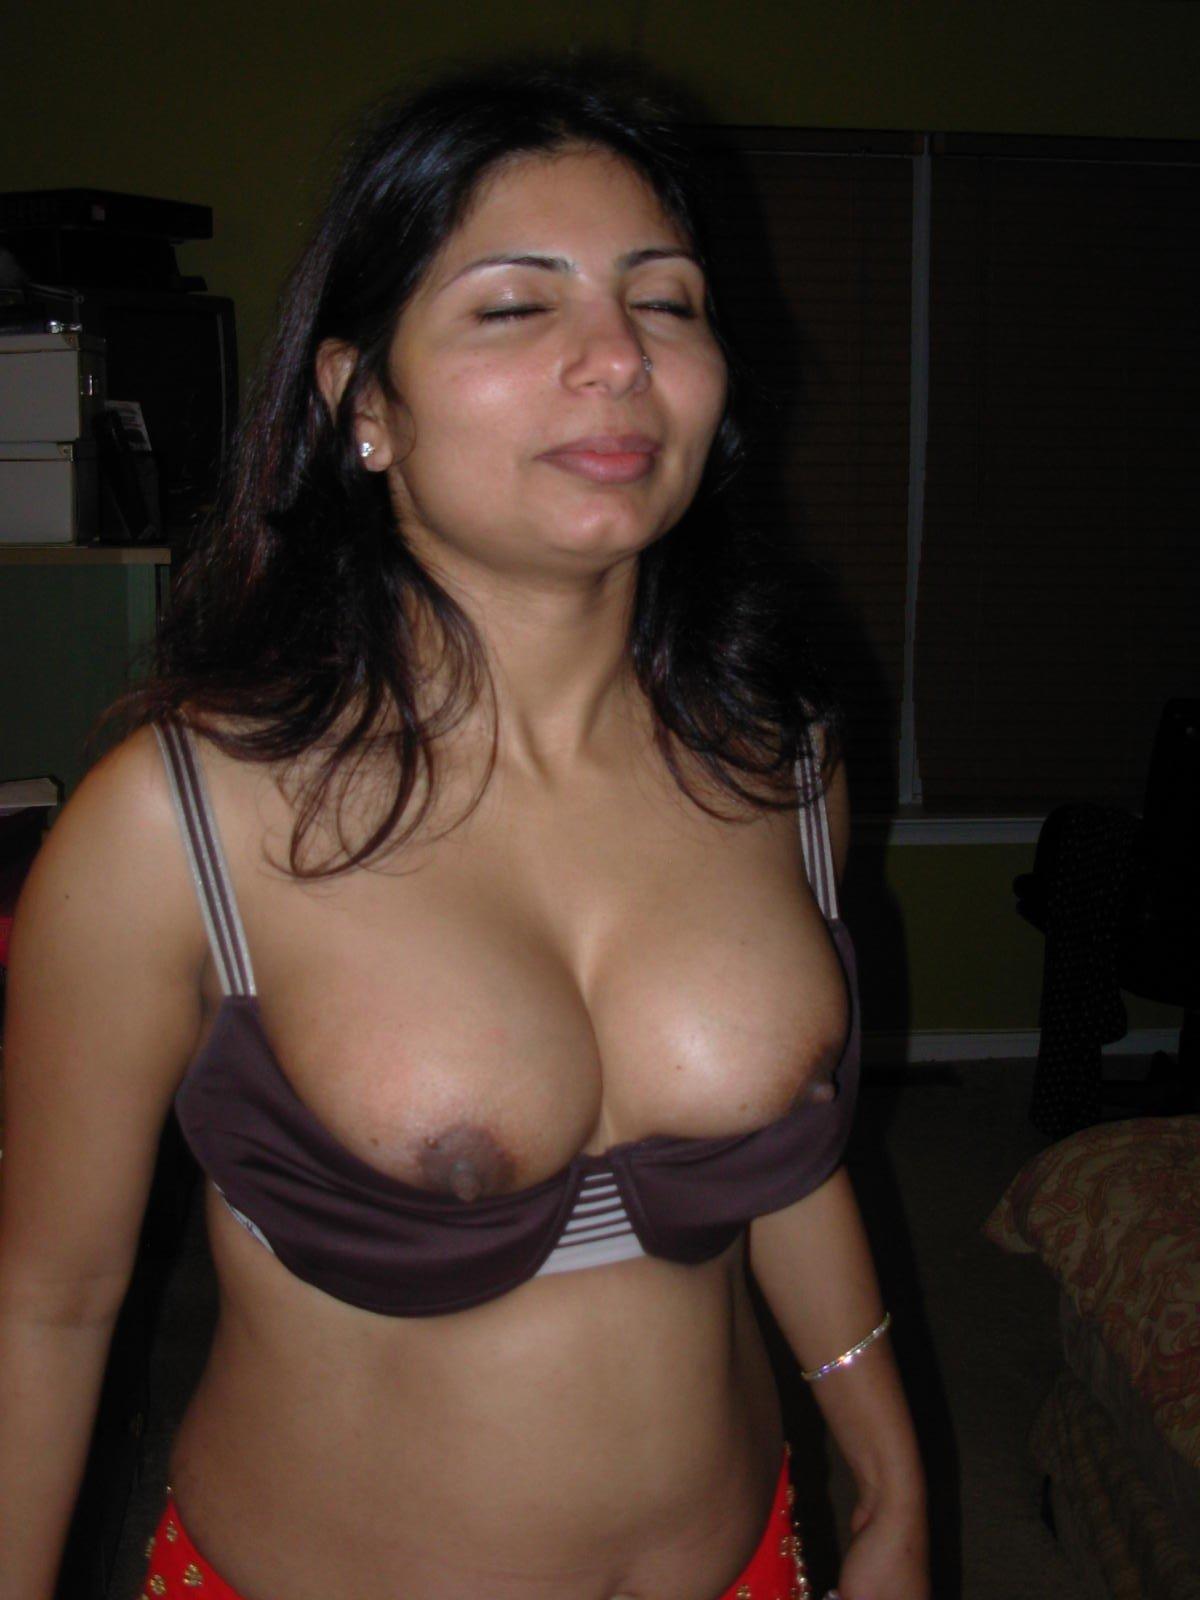 Tamil aunty bra nude